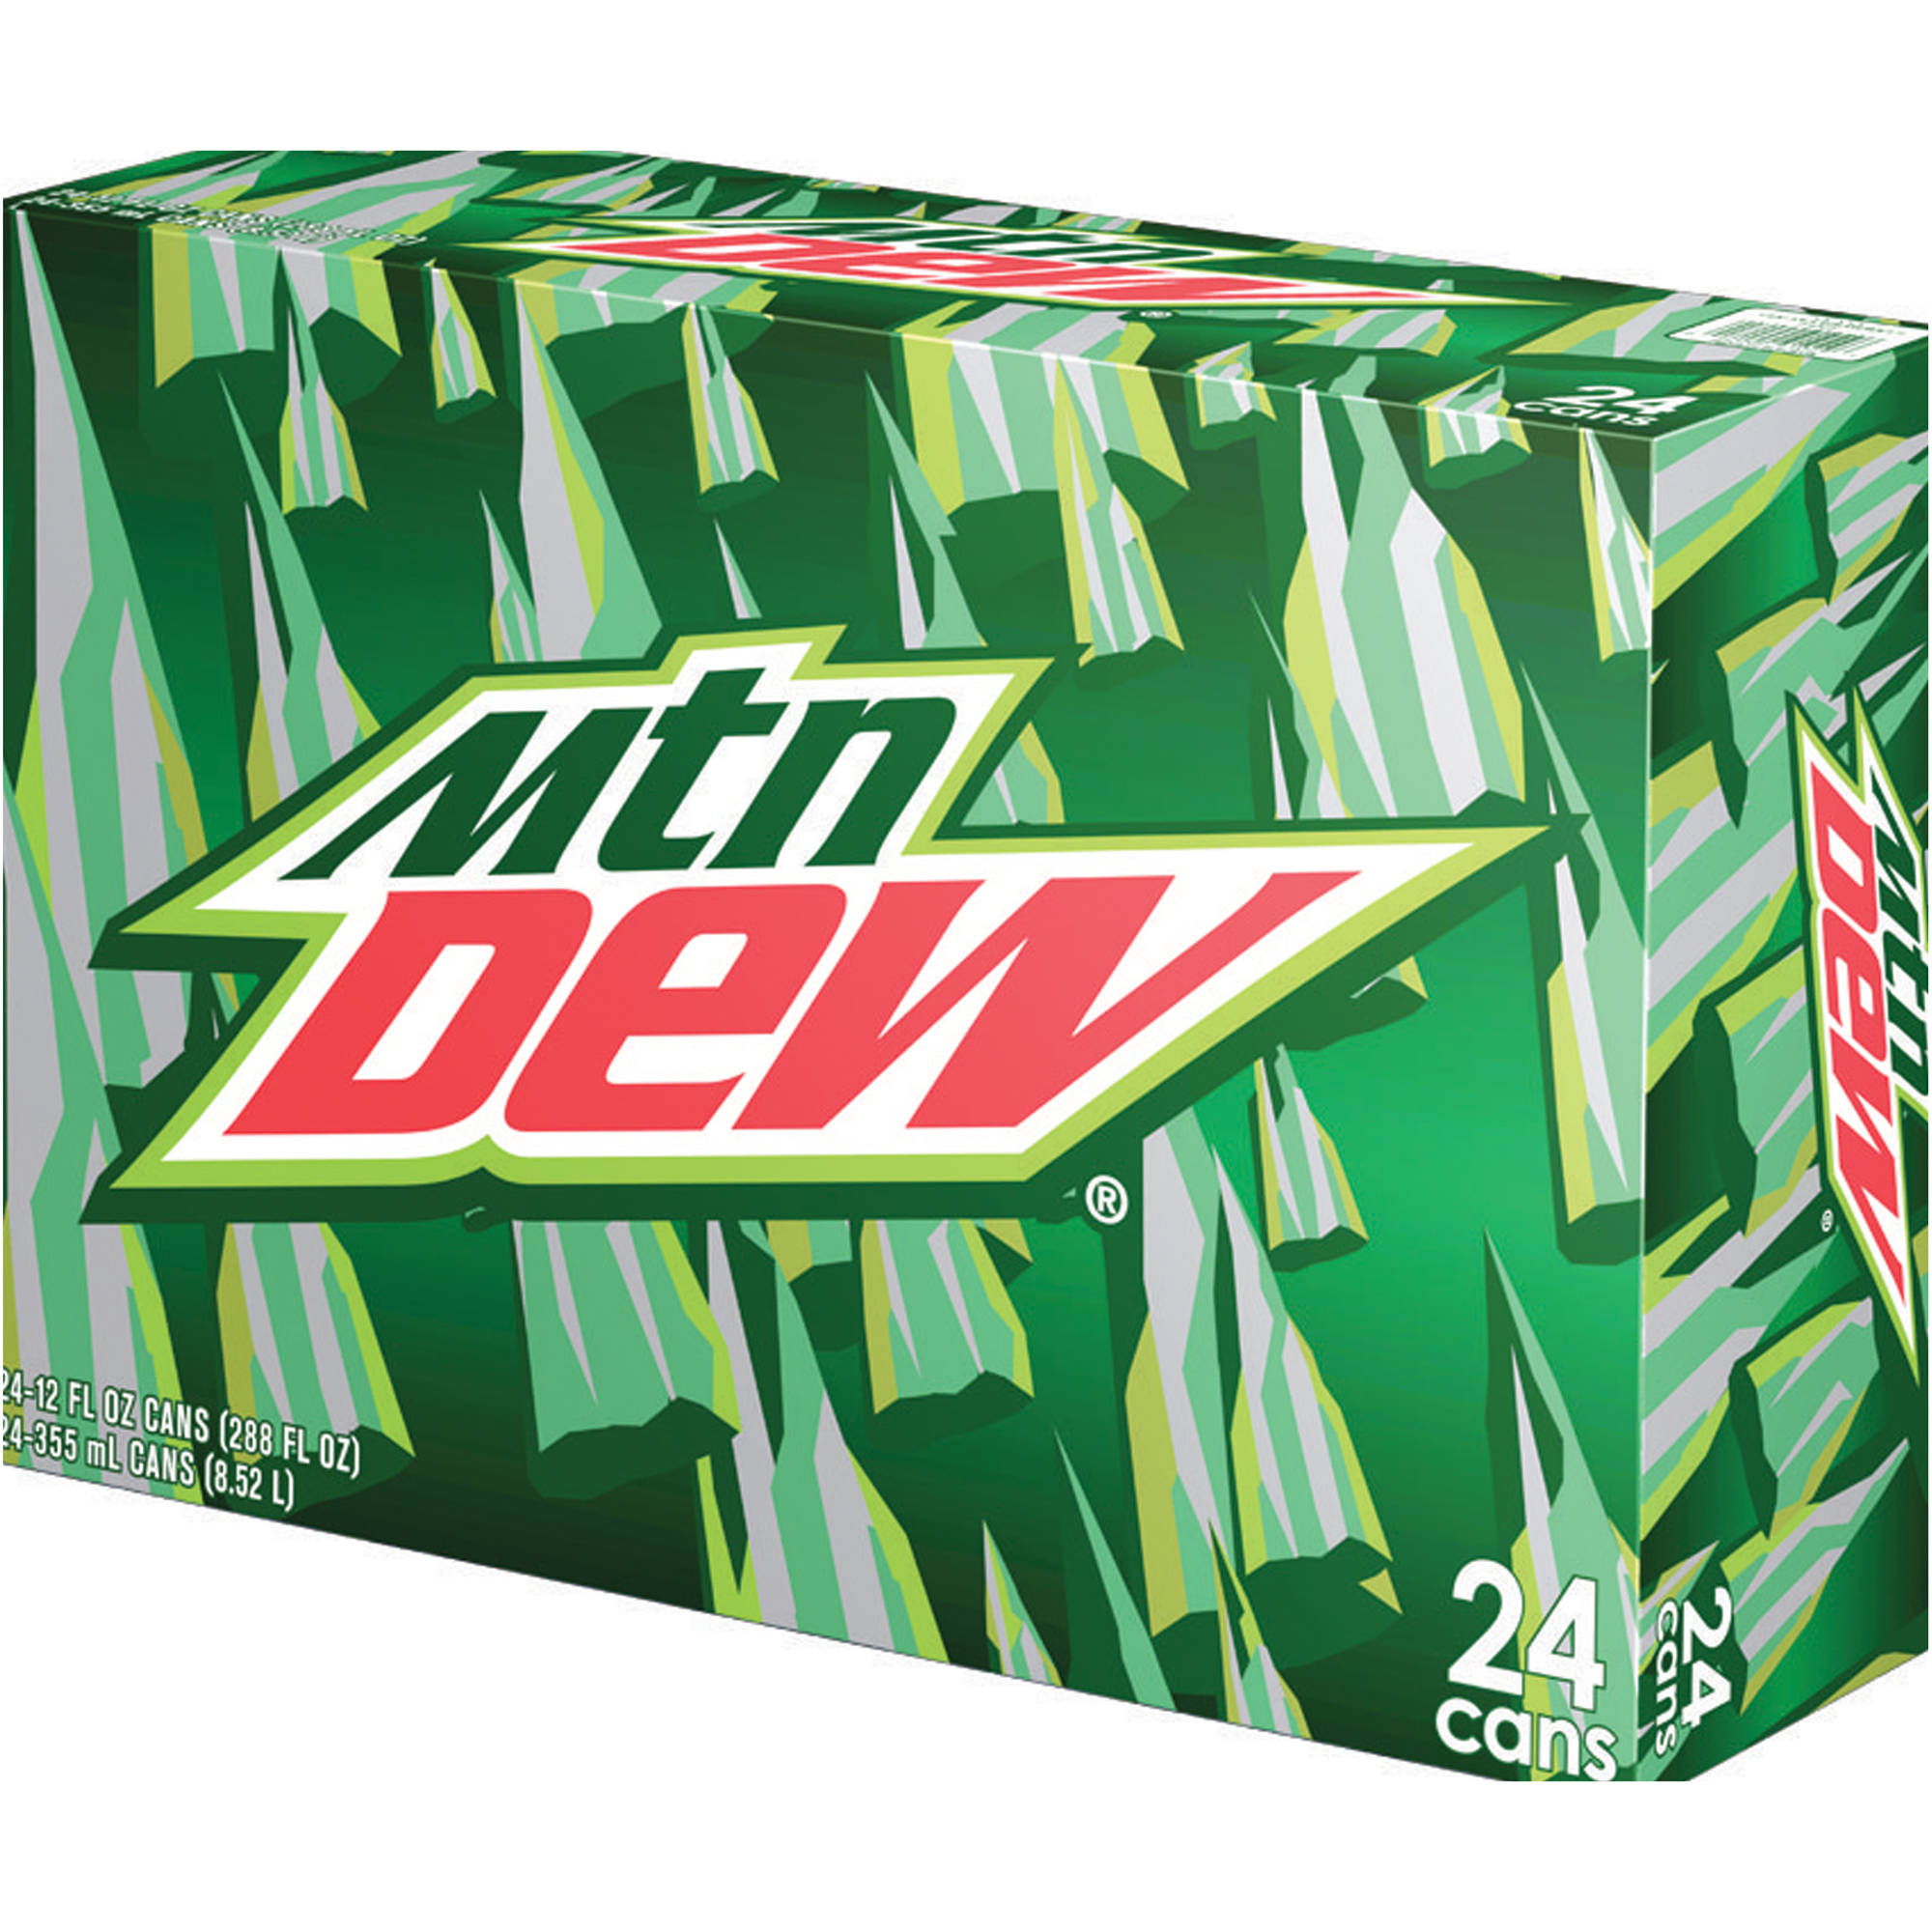 Mountain Dew Soda, 12 fl oz, 24 pack